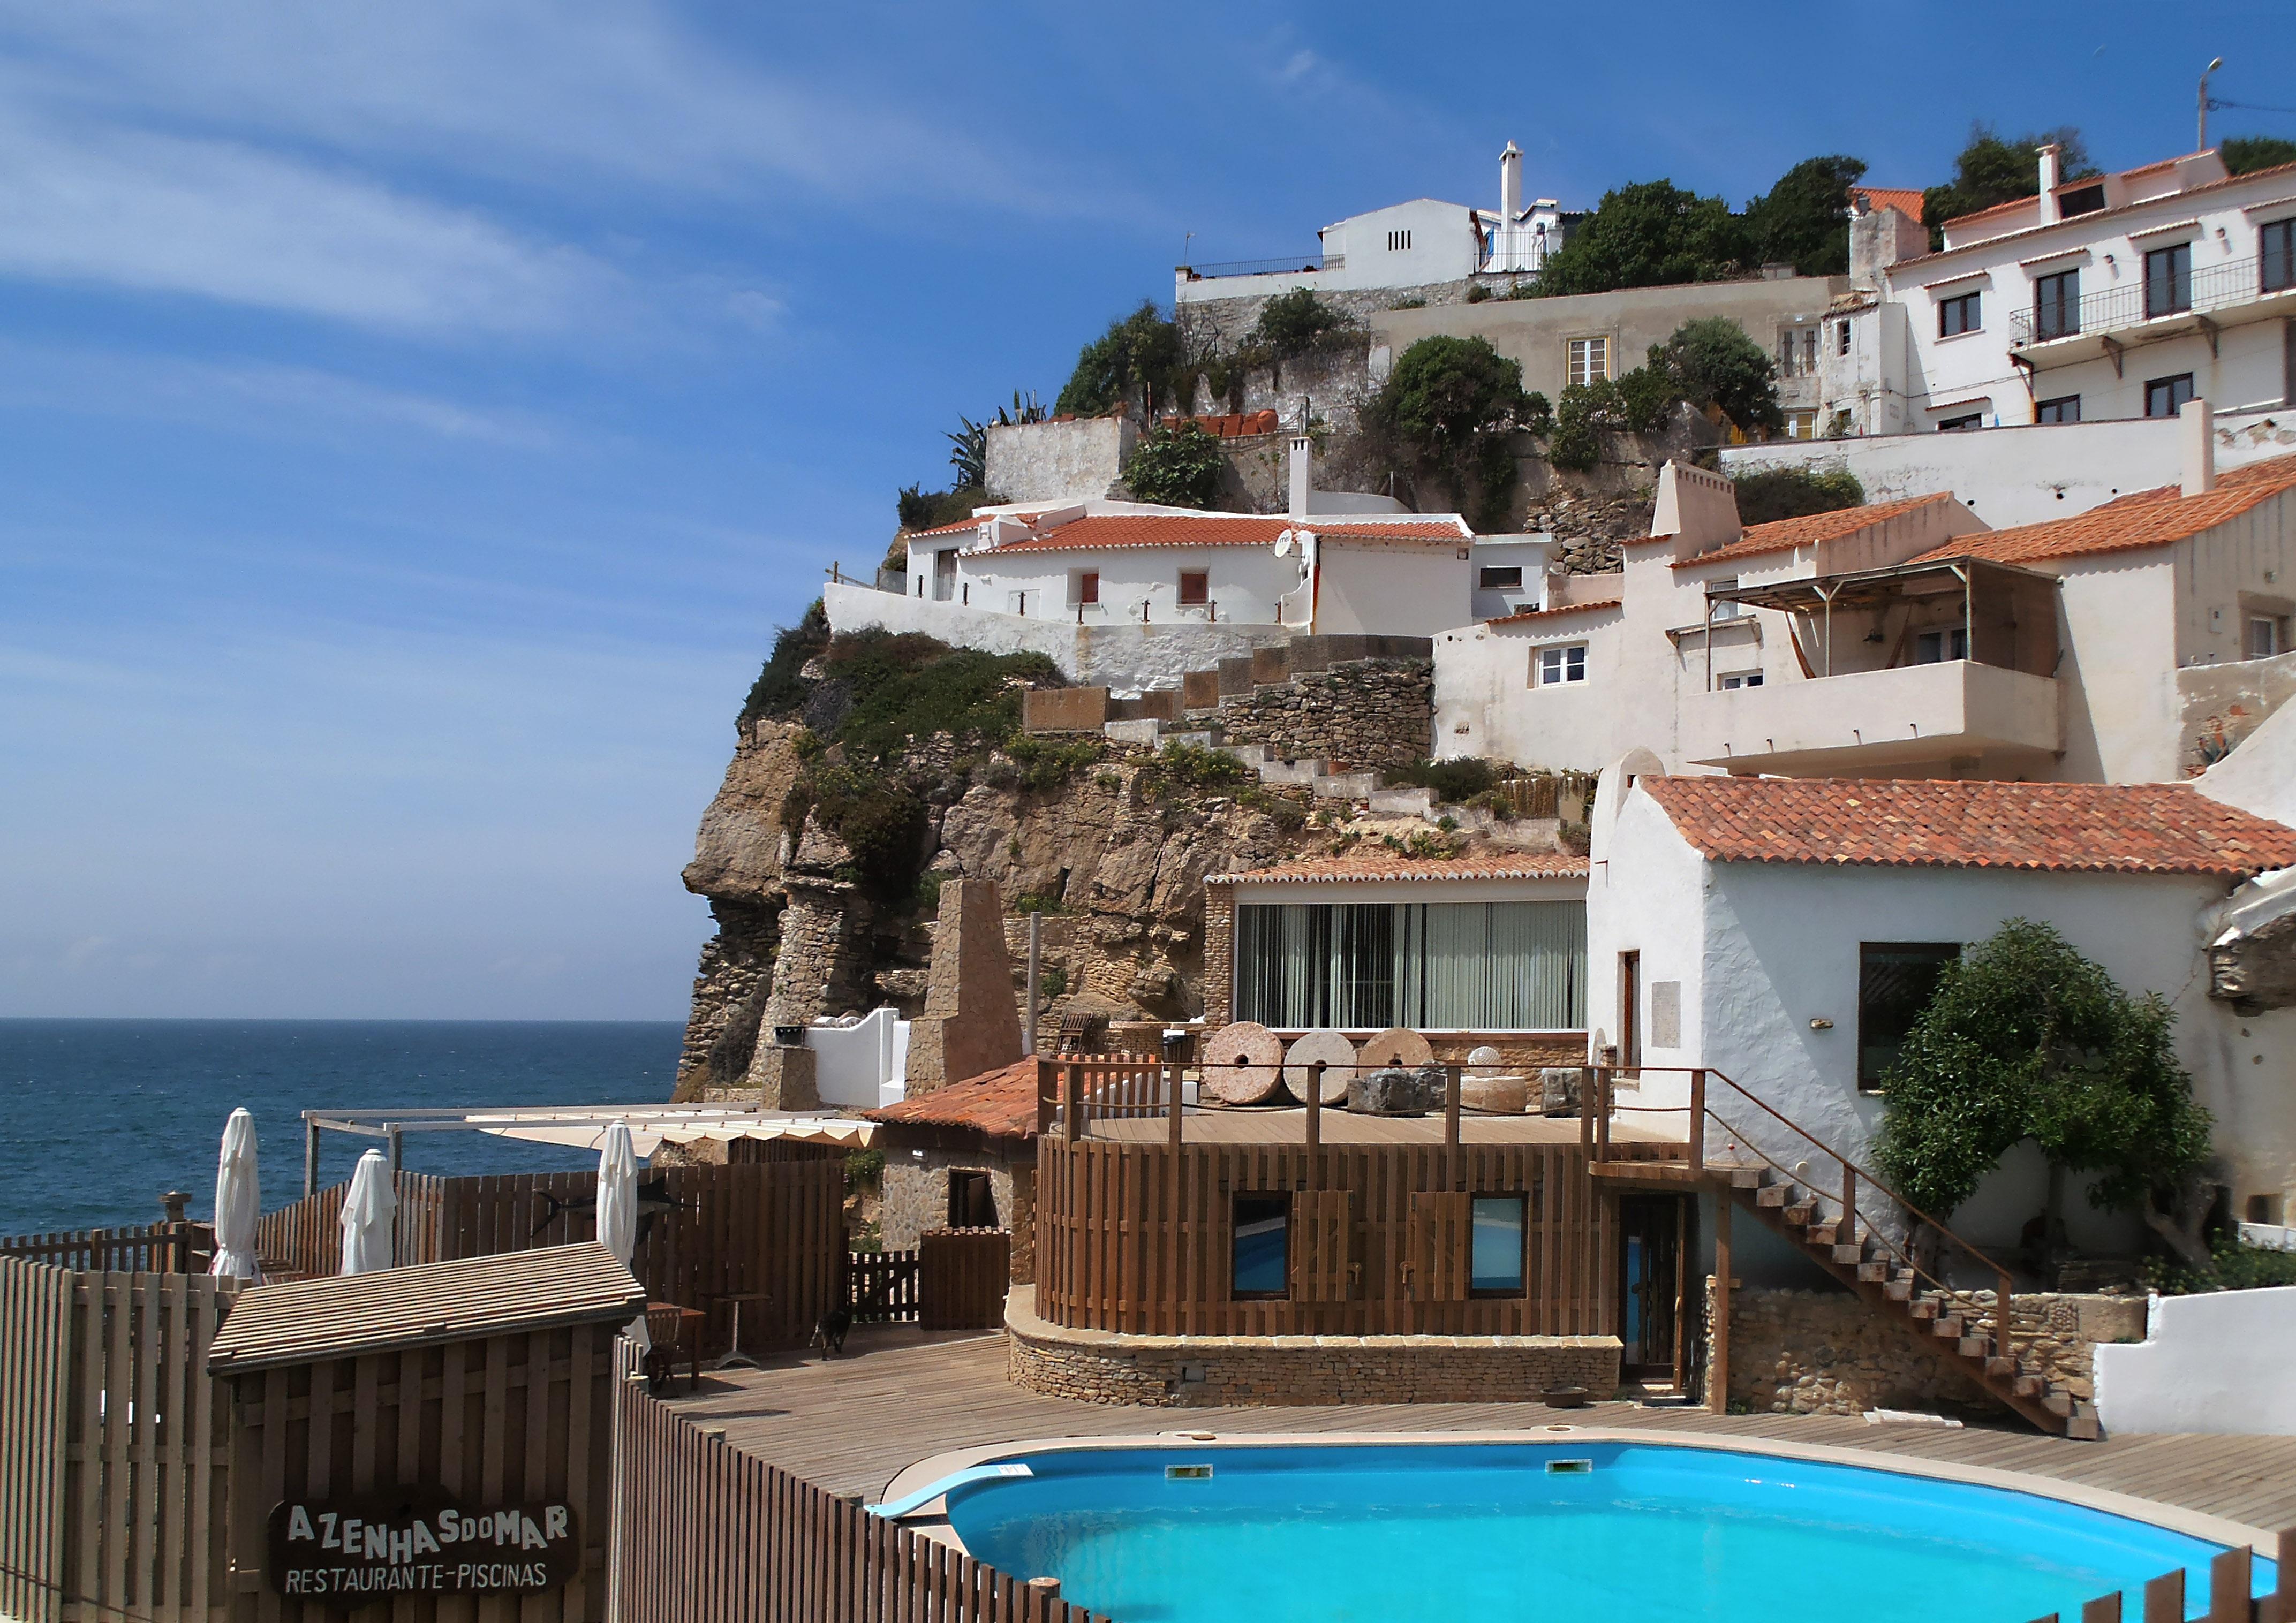 Fotos Gratis Costa Agua Oceano Villa Palacio Casa